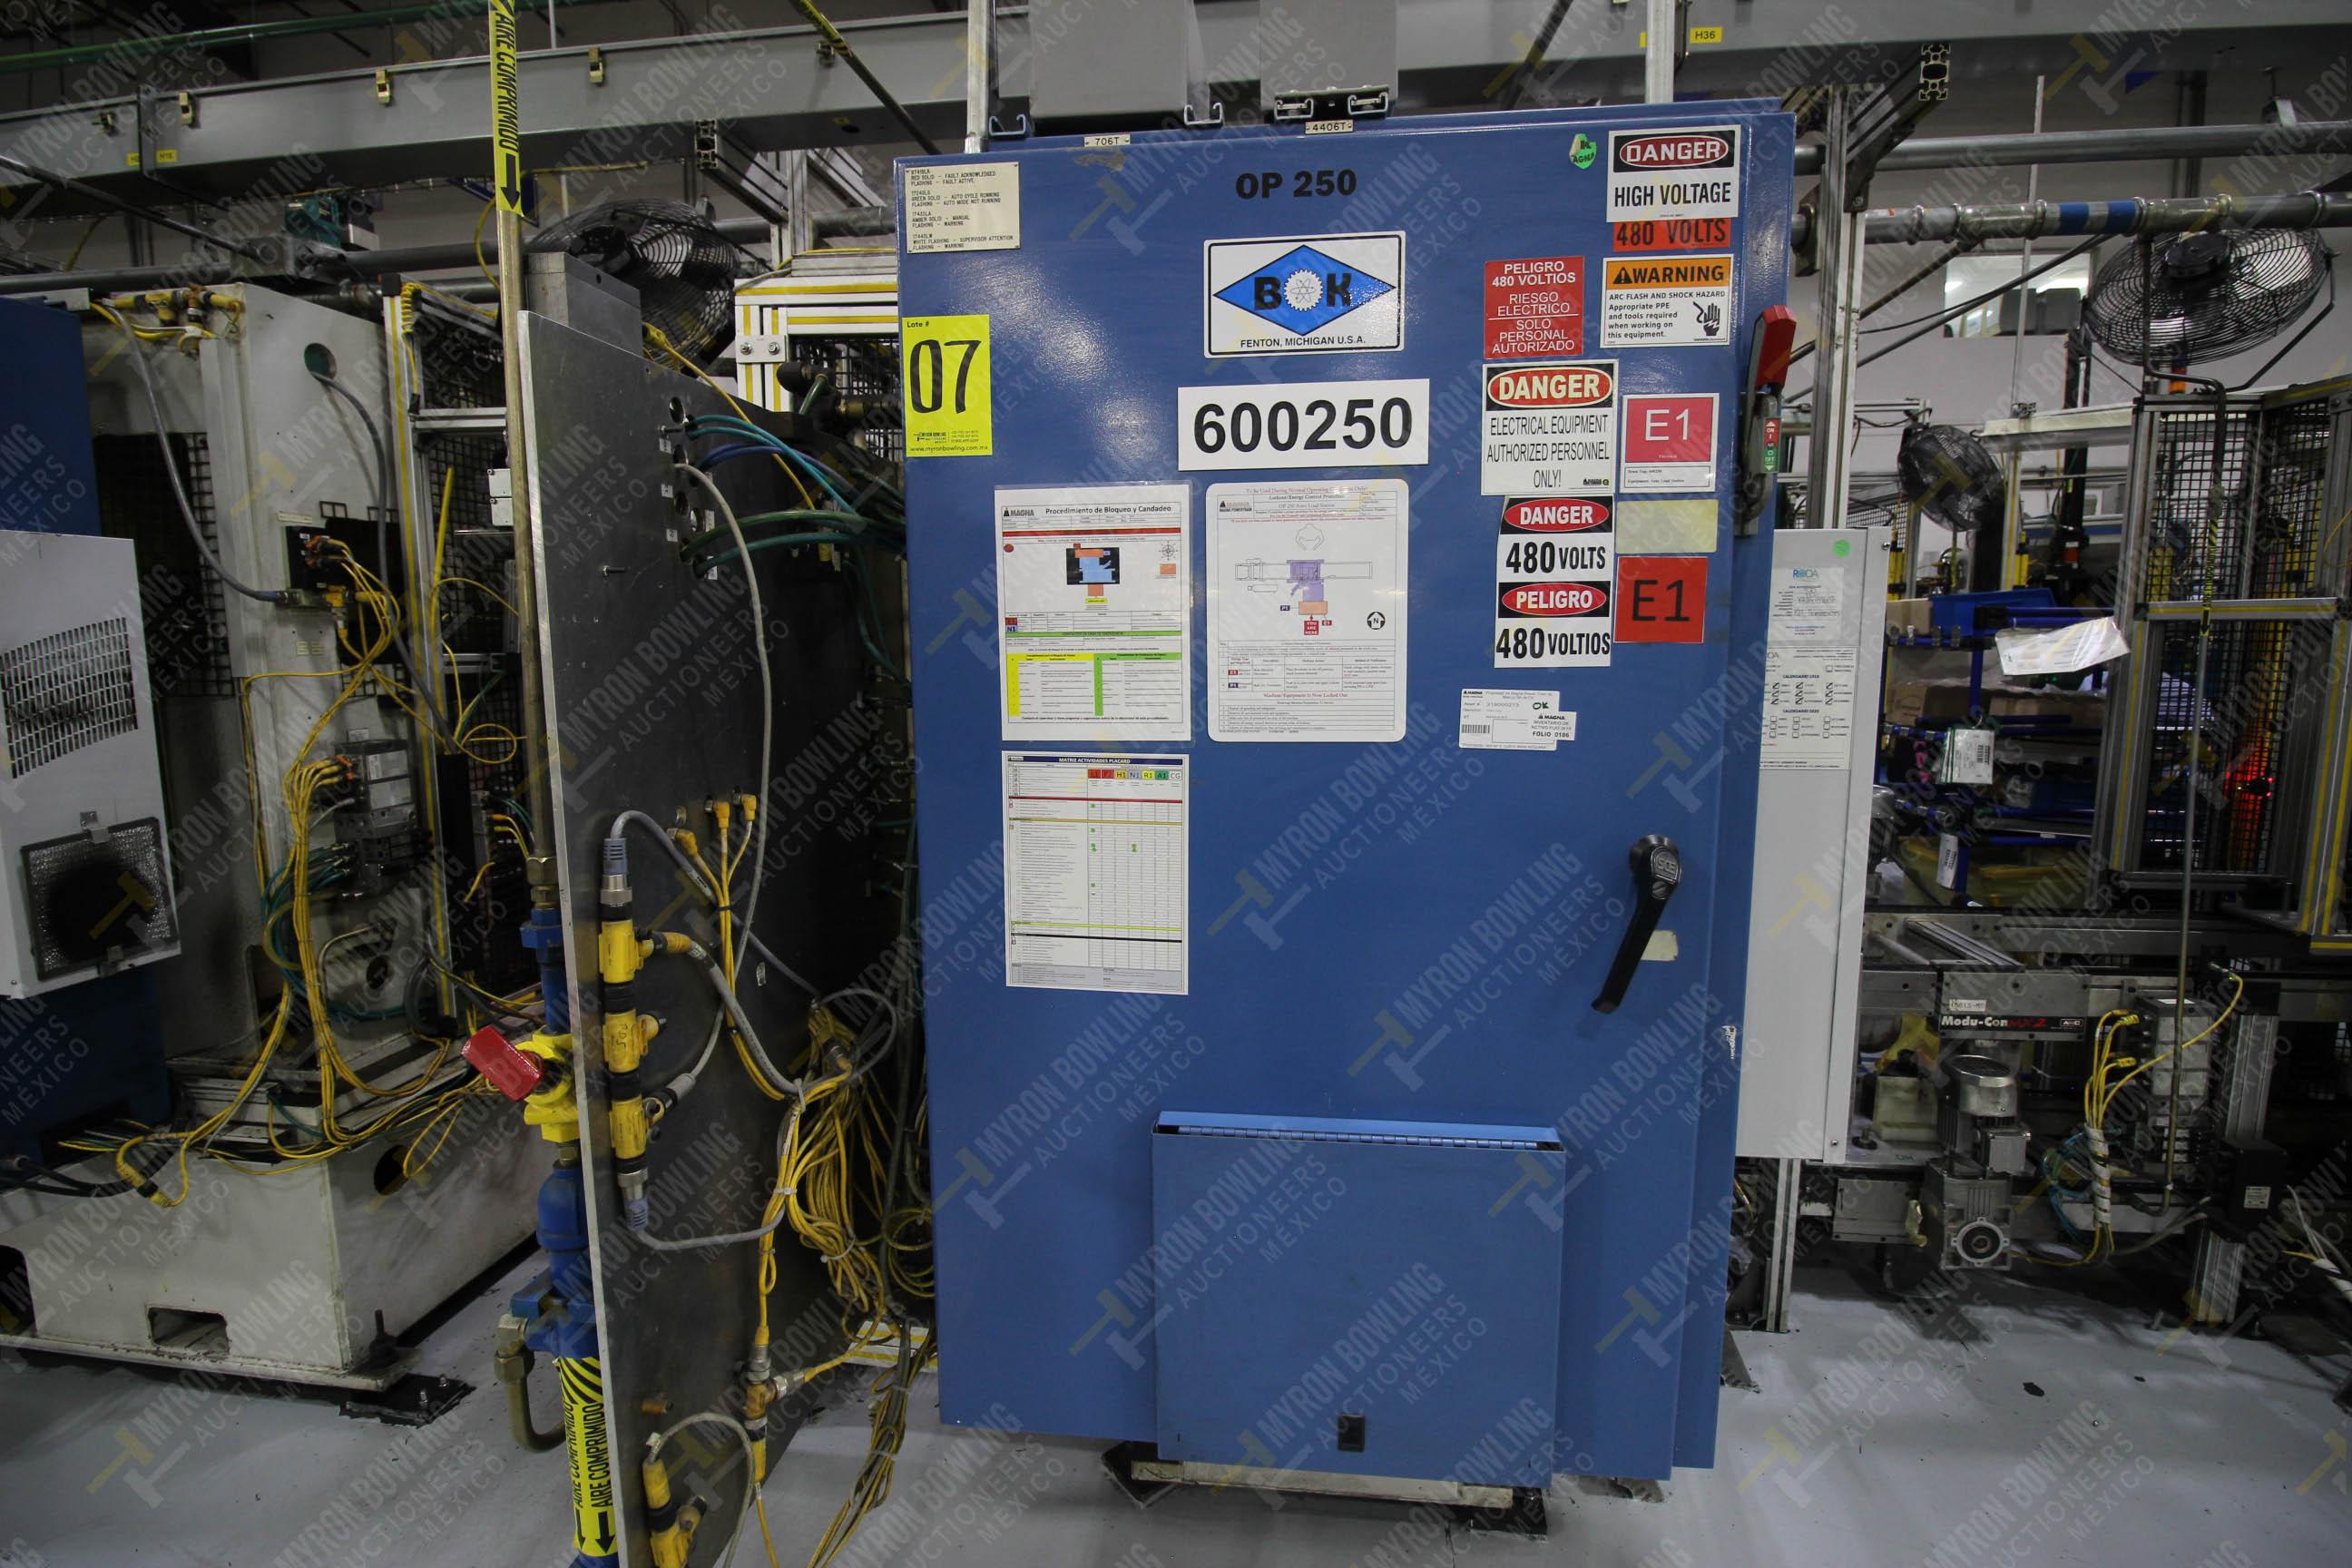 Estación semiautomática para operación 250 de ensamble de candado, contiene - Image 17 of 21